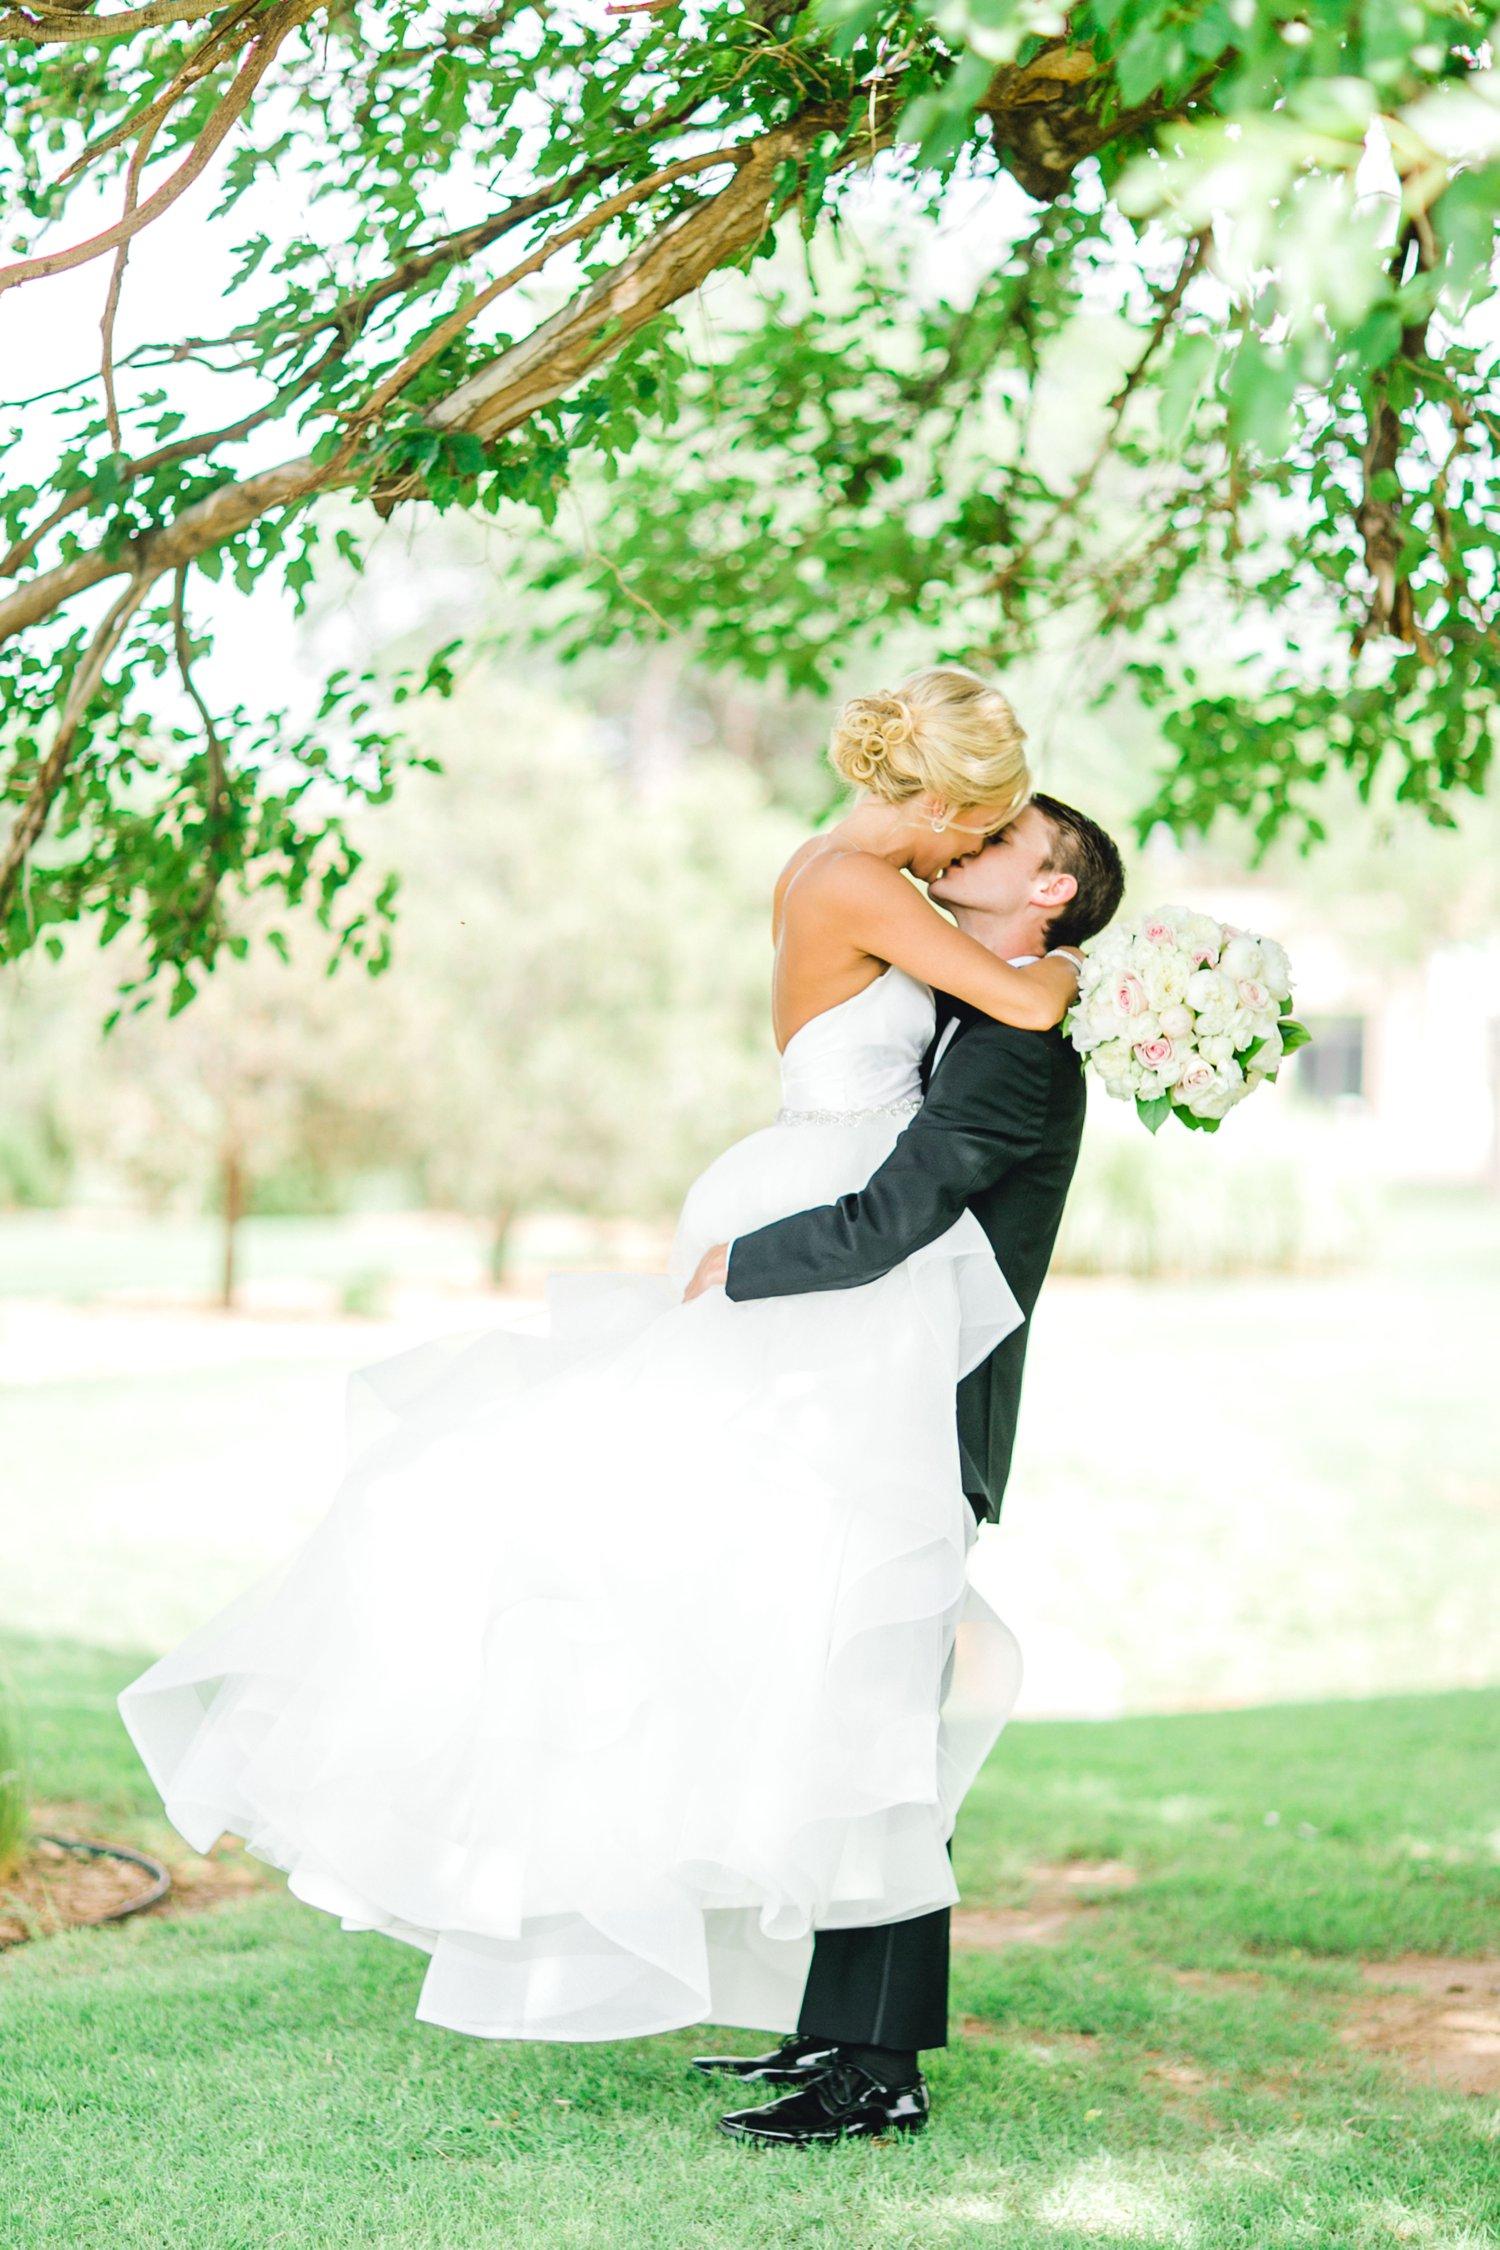 Taylor-and-Brock-Williams-Texas-Tech-University-Merket-Alumni-Center-Lubbock-Photographer-ALLEEJ0085.jpg